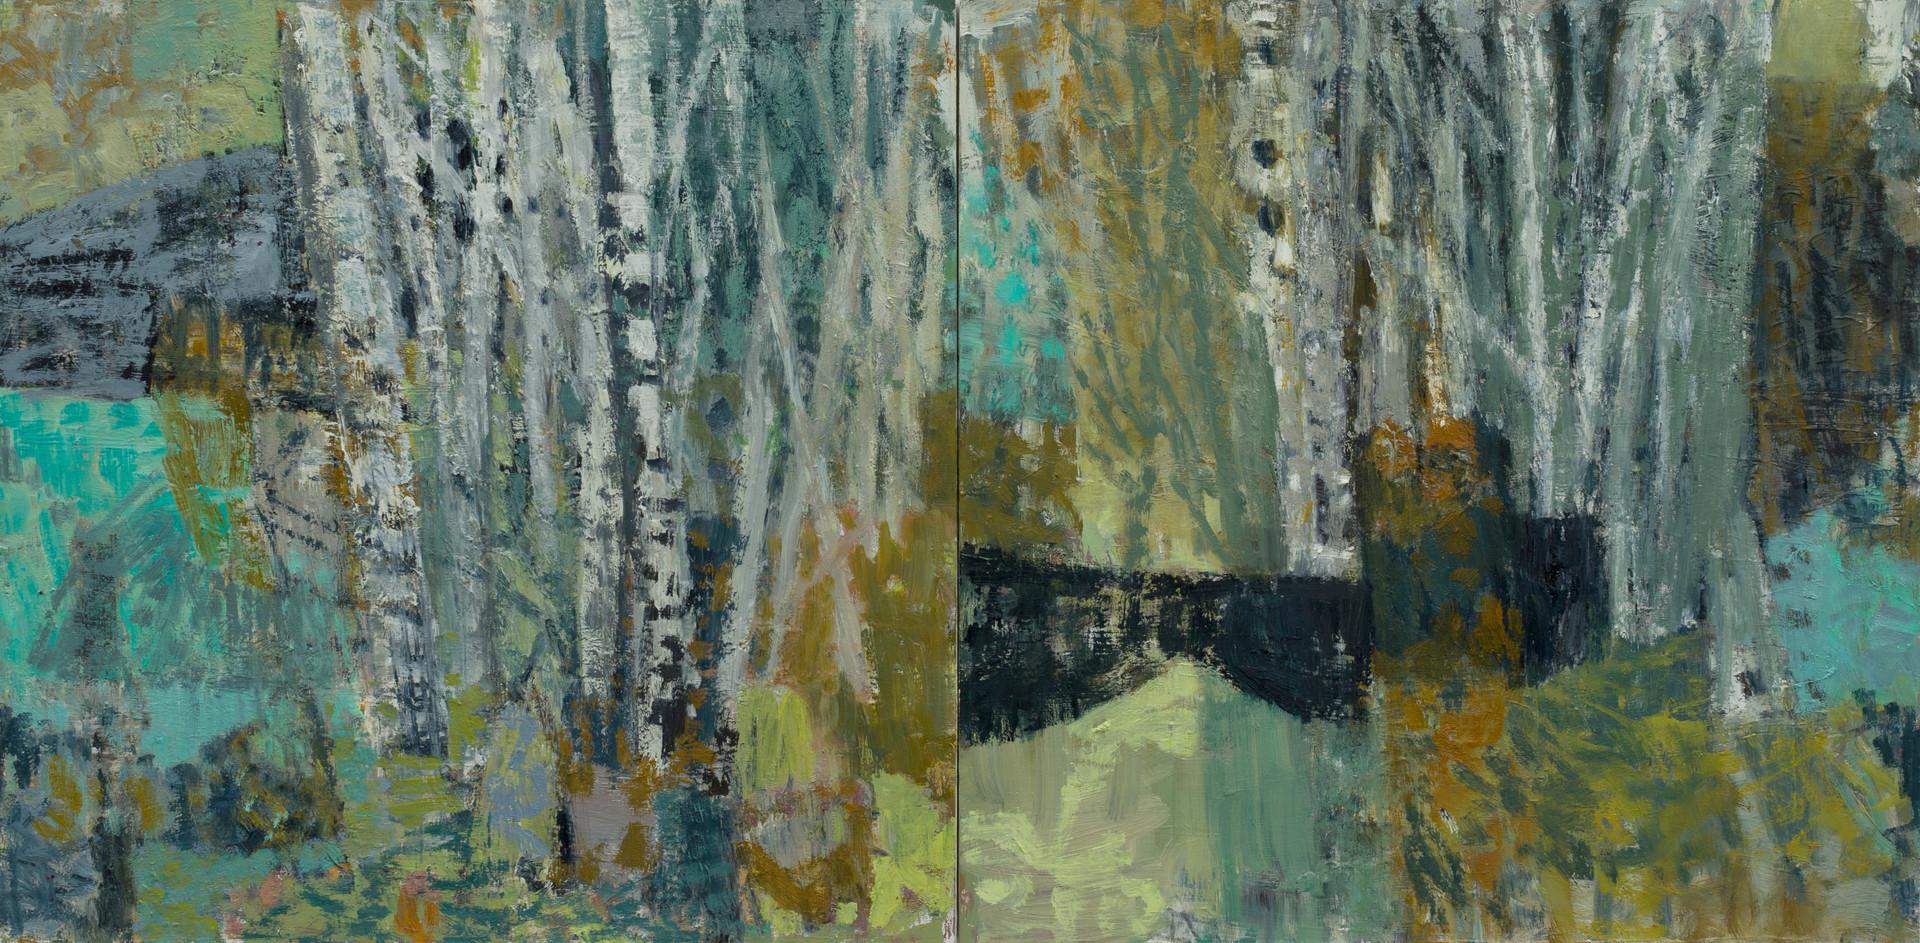 Where the birch meets the sea 2019 oil on linen 60 x 120cm